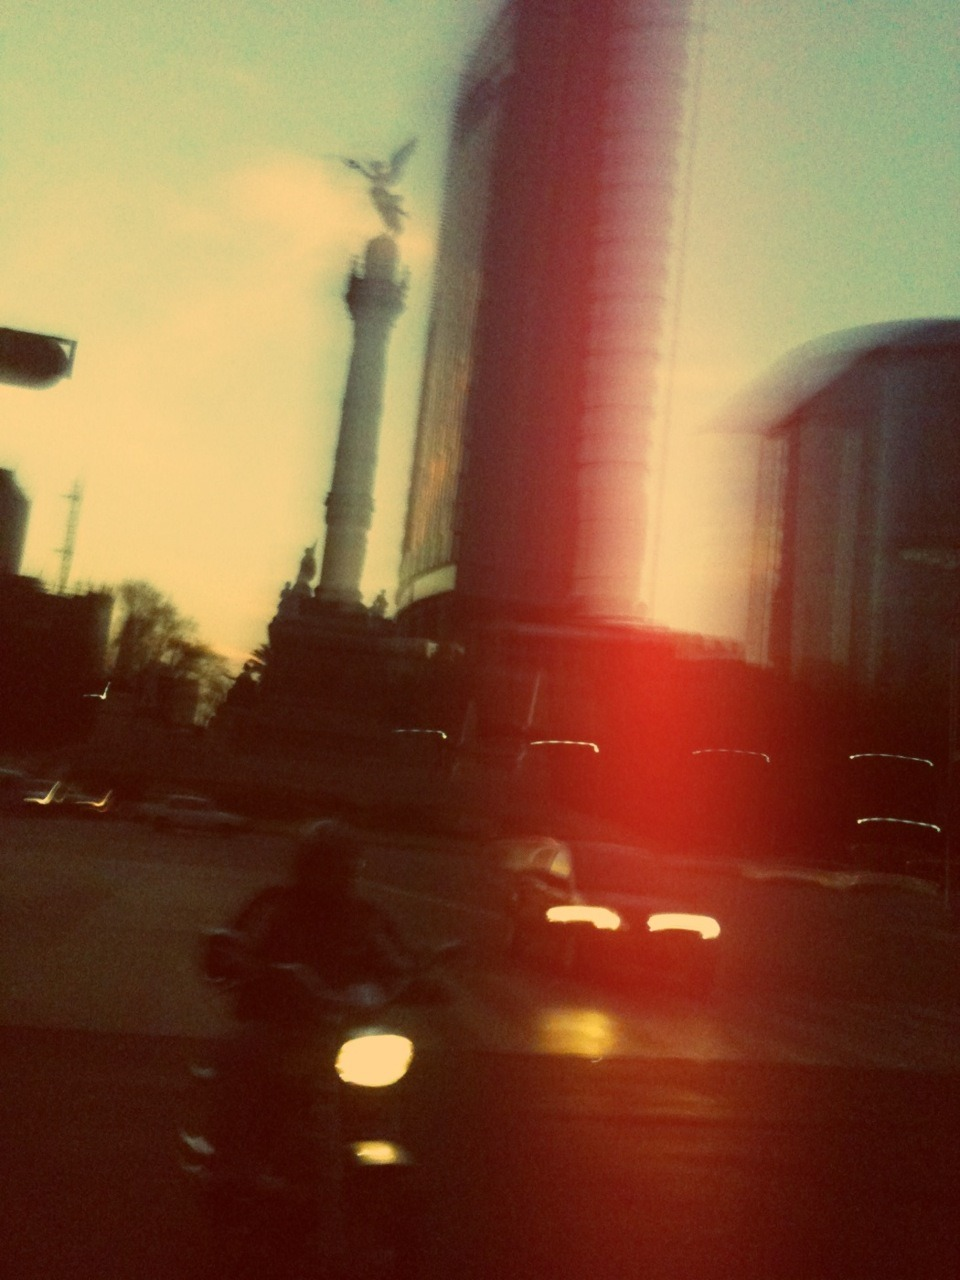 tumblr_lv1a7bxFve1qzaju6o3_1280.jpg